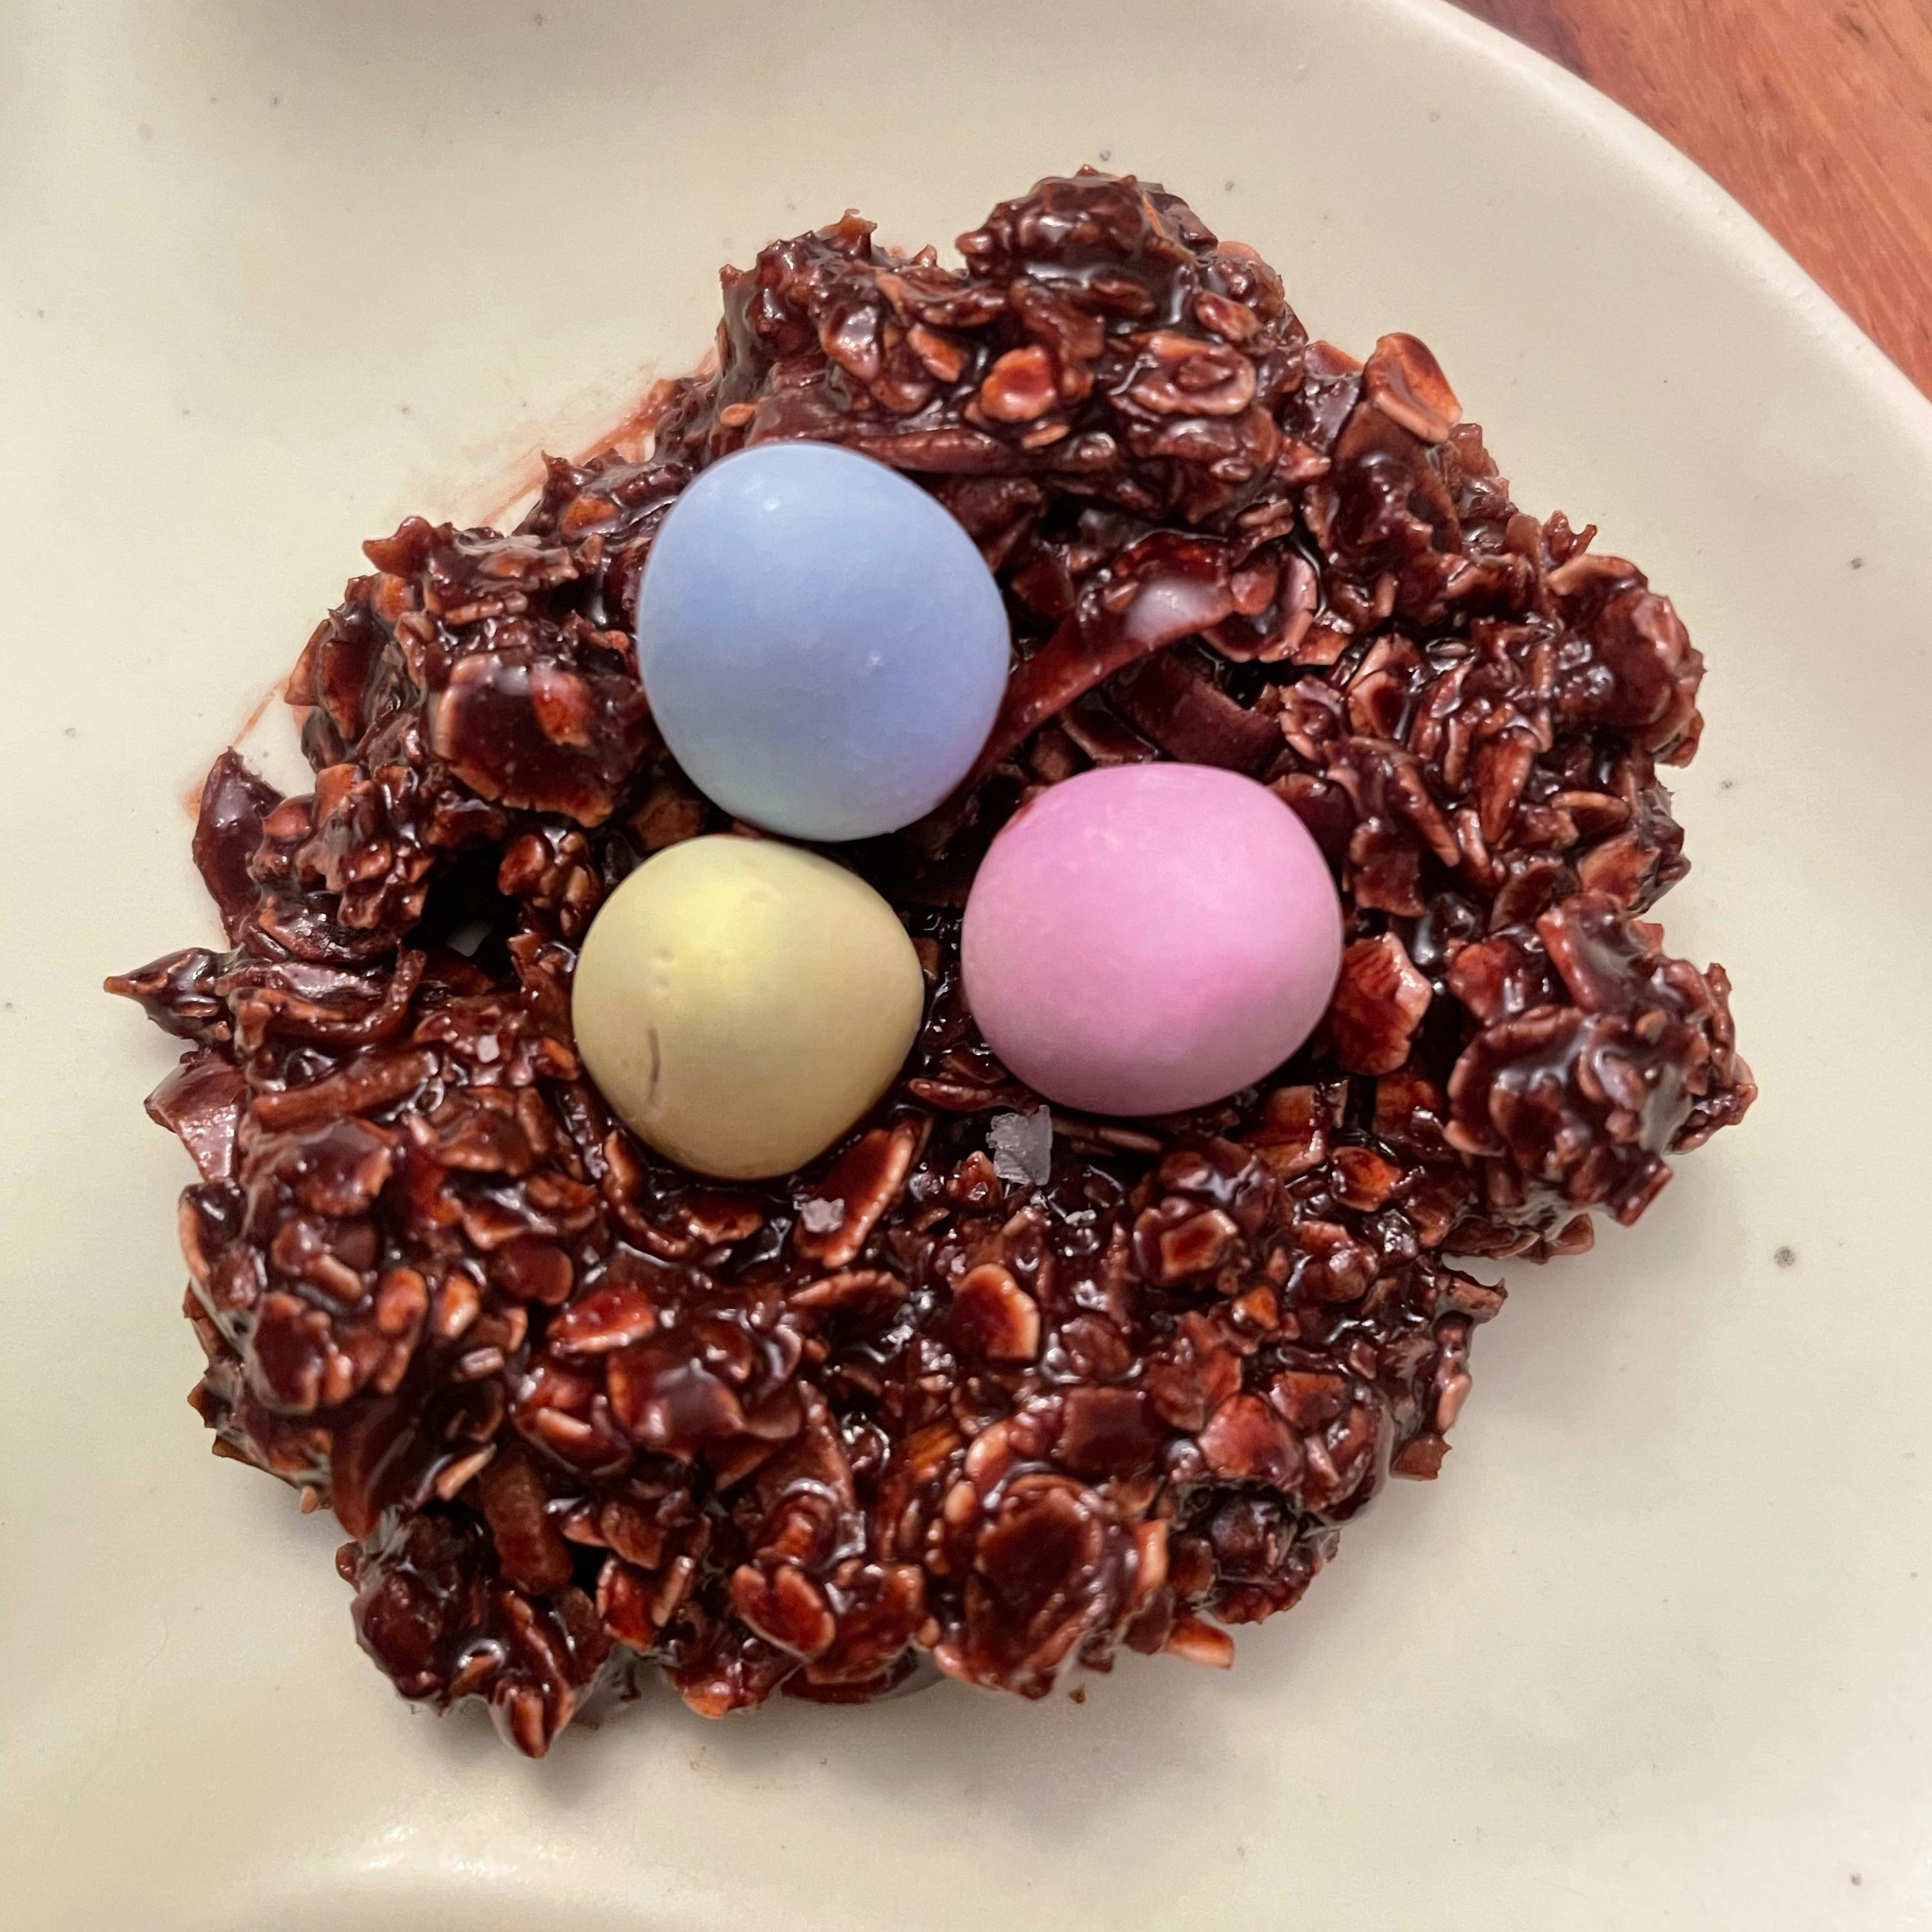 Peanut-Free Chocolate Macaroons